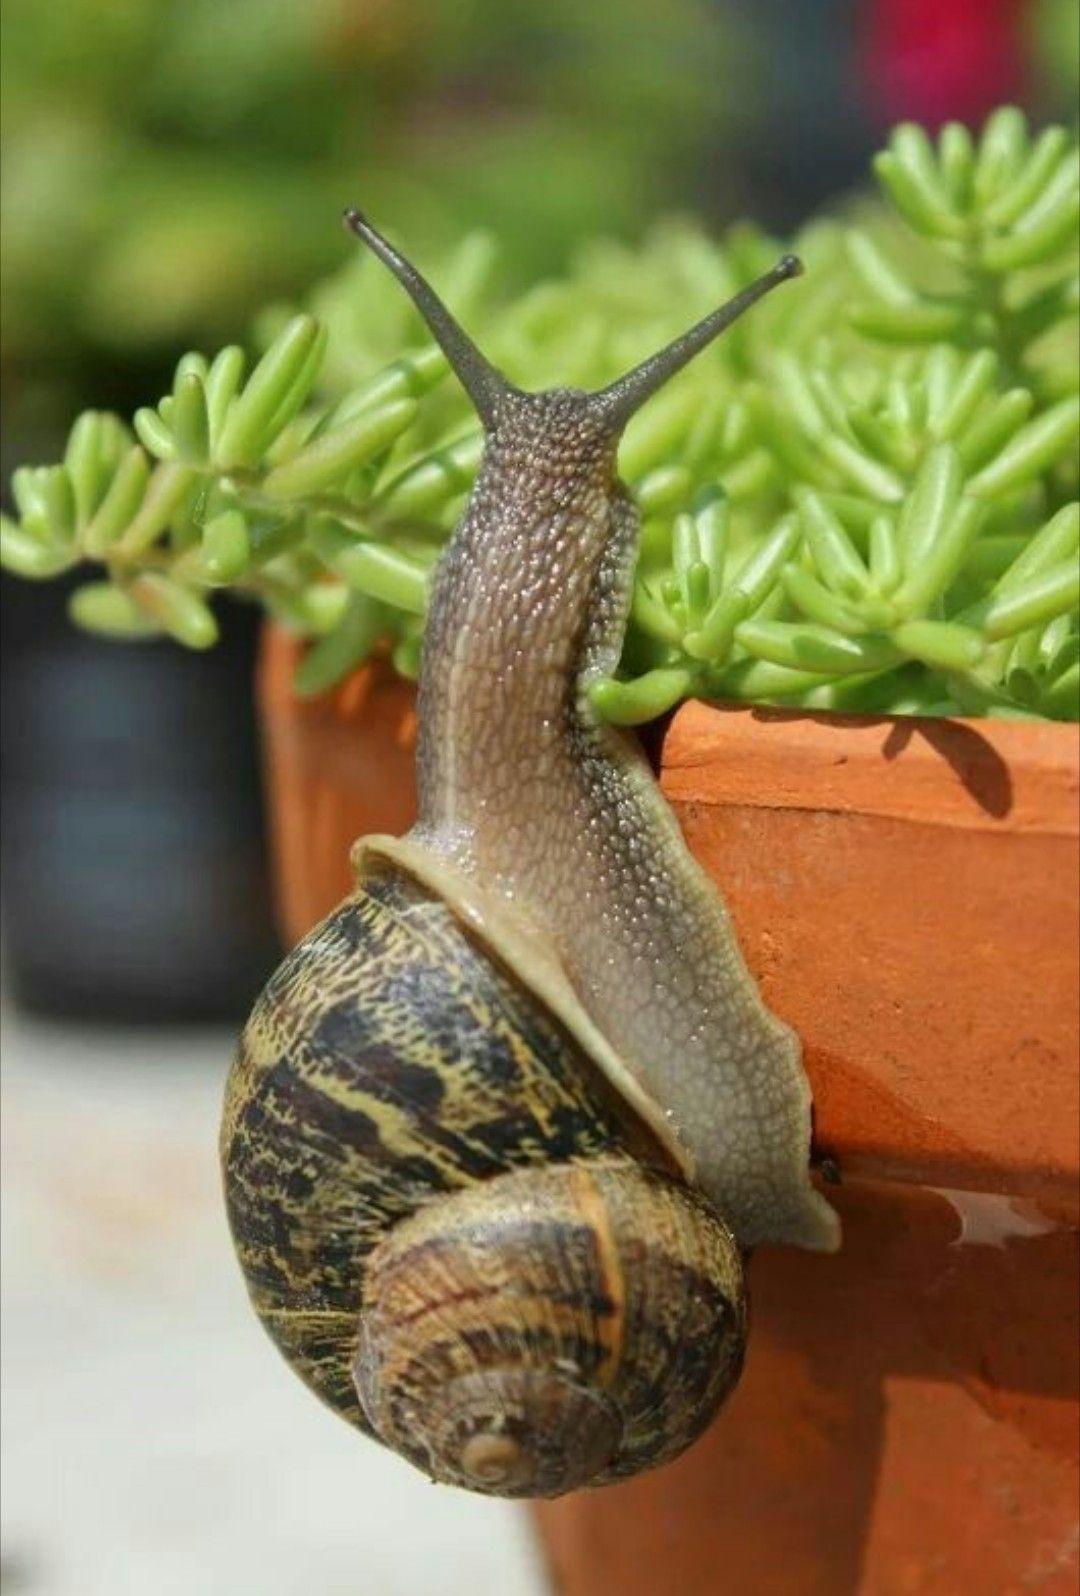 Escargot | Snails in garden, Pet snails